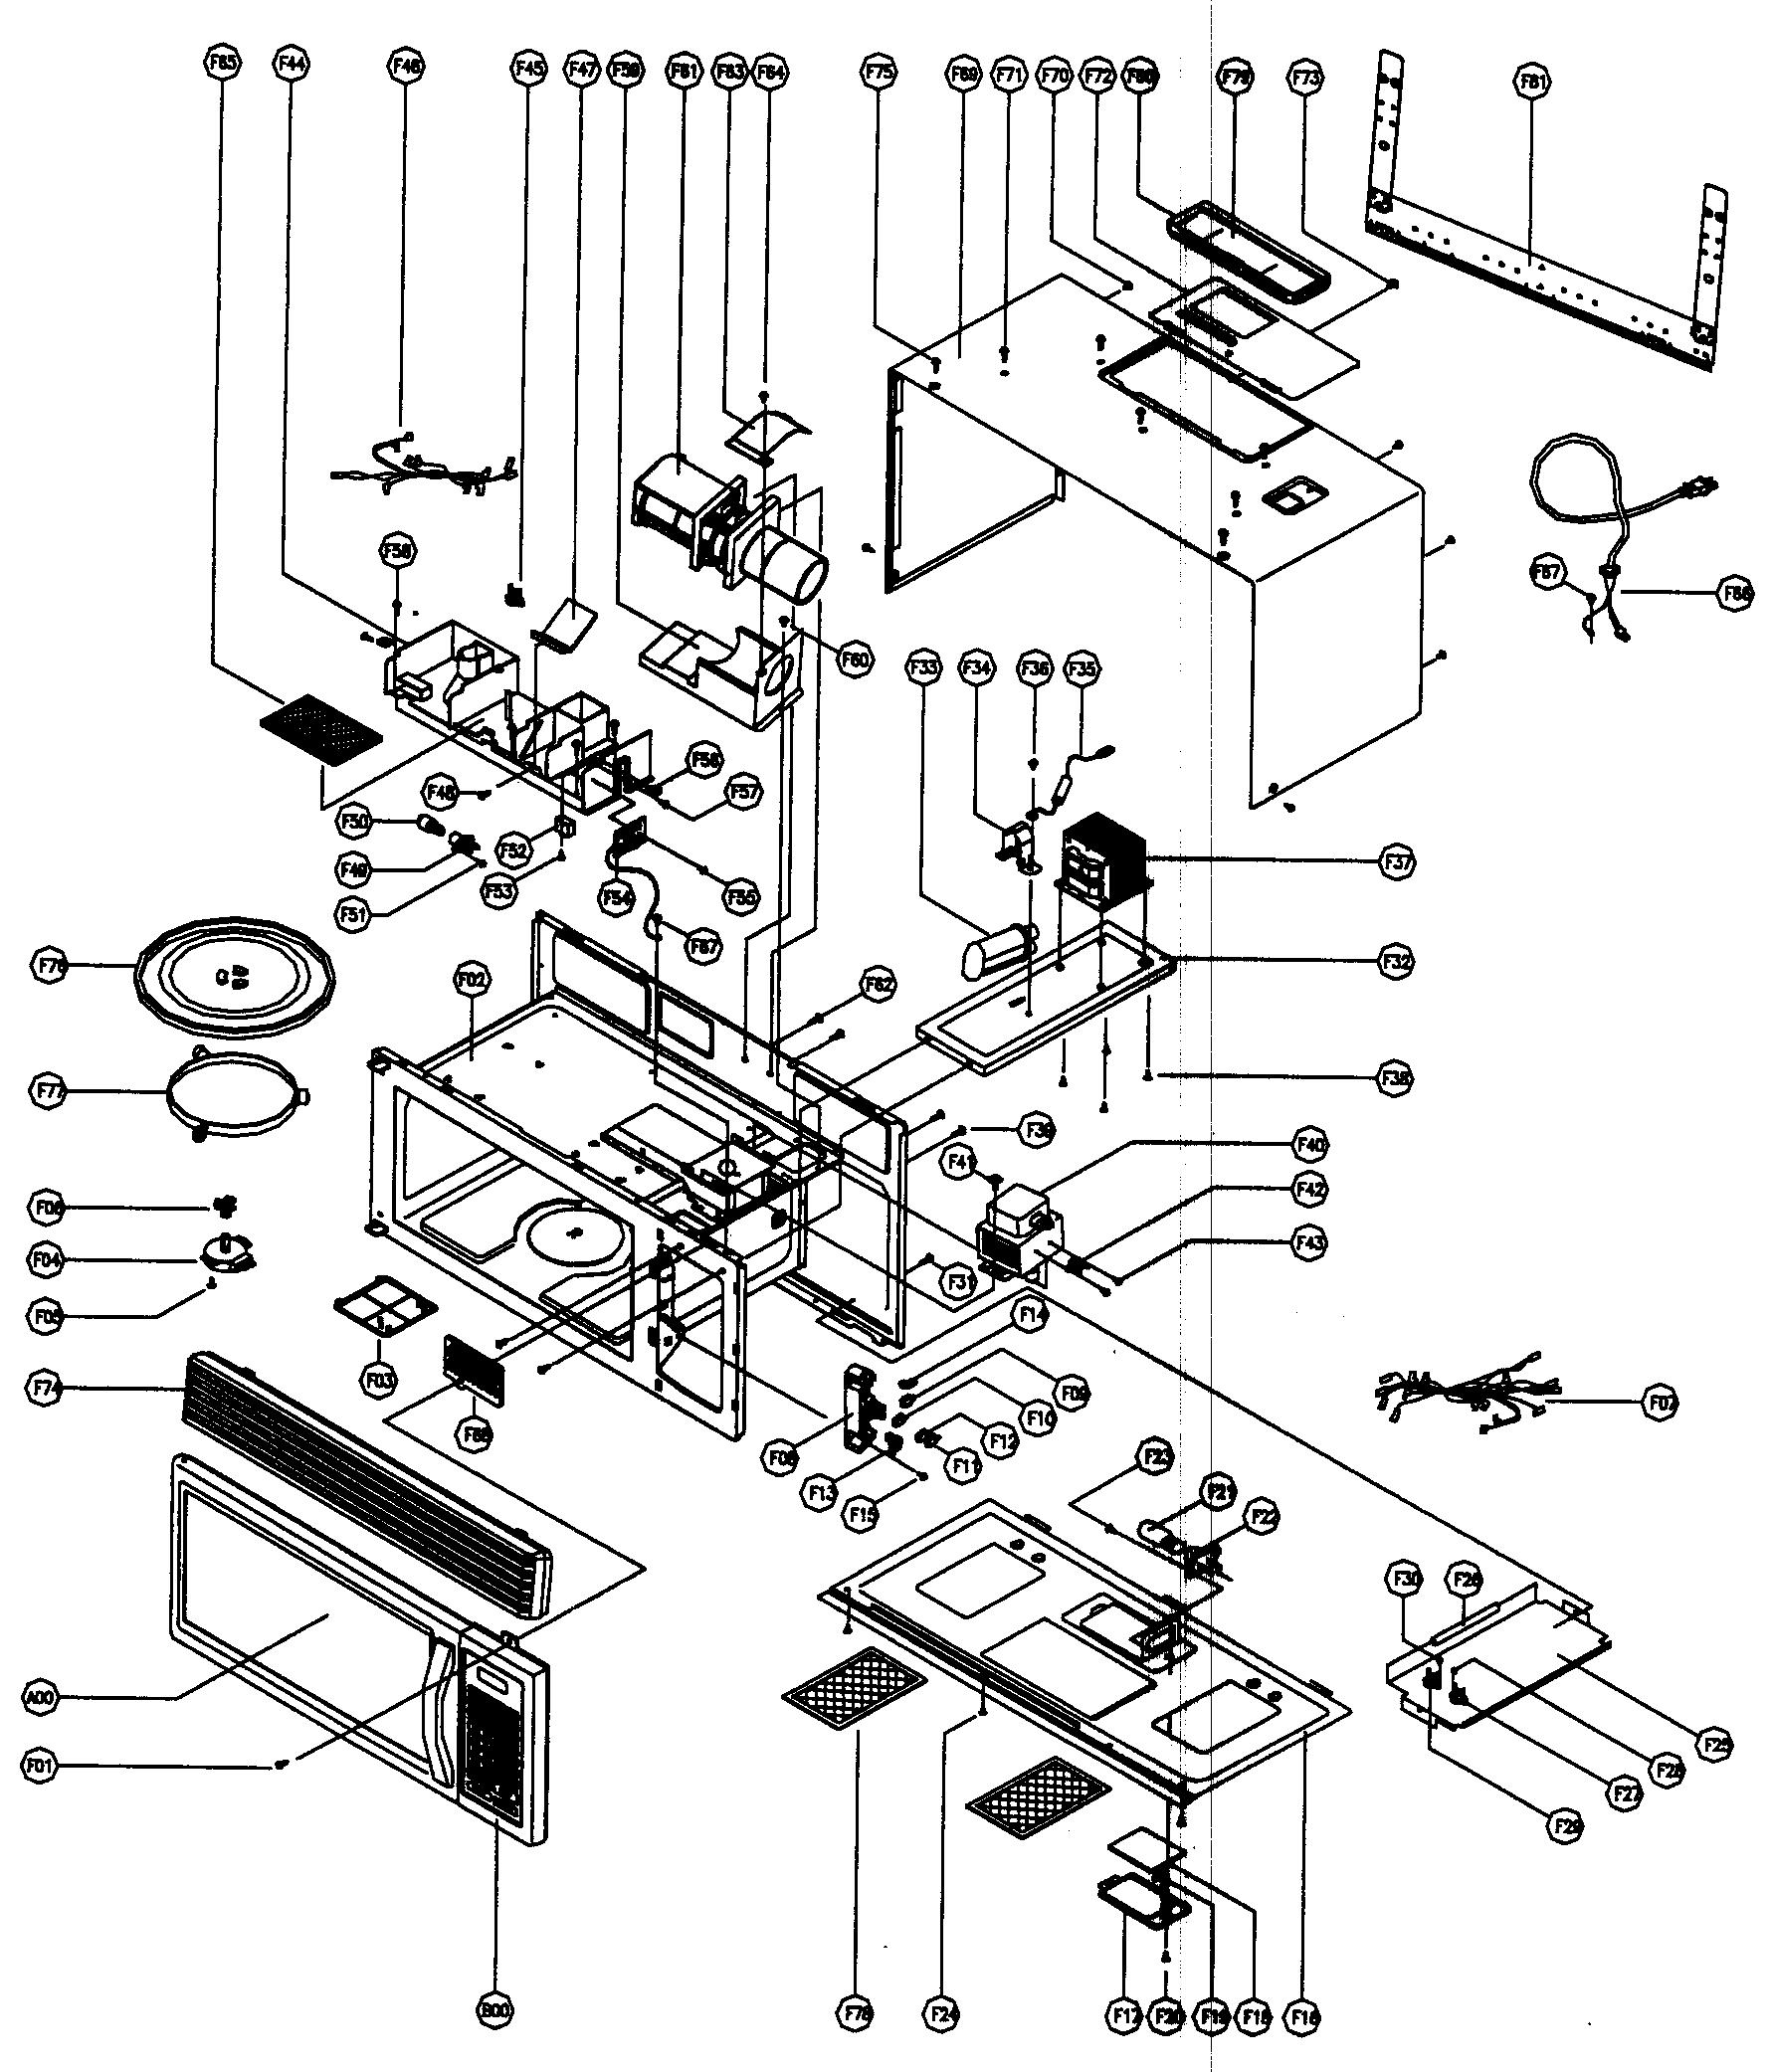 Magic chef model mco160ub microwave hood bo genuine parts